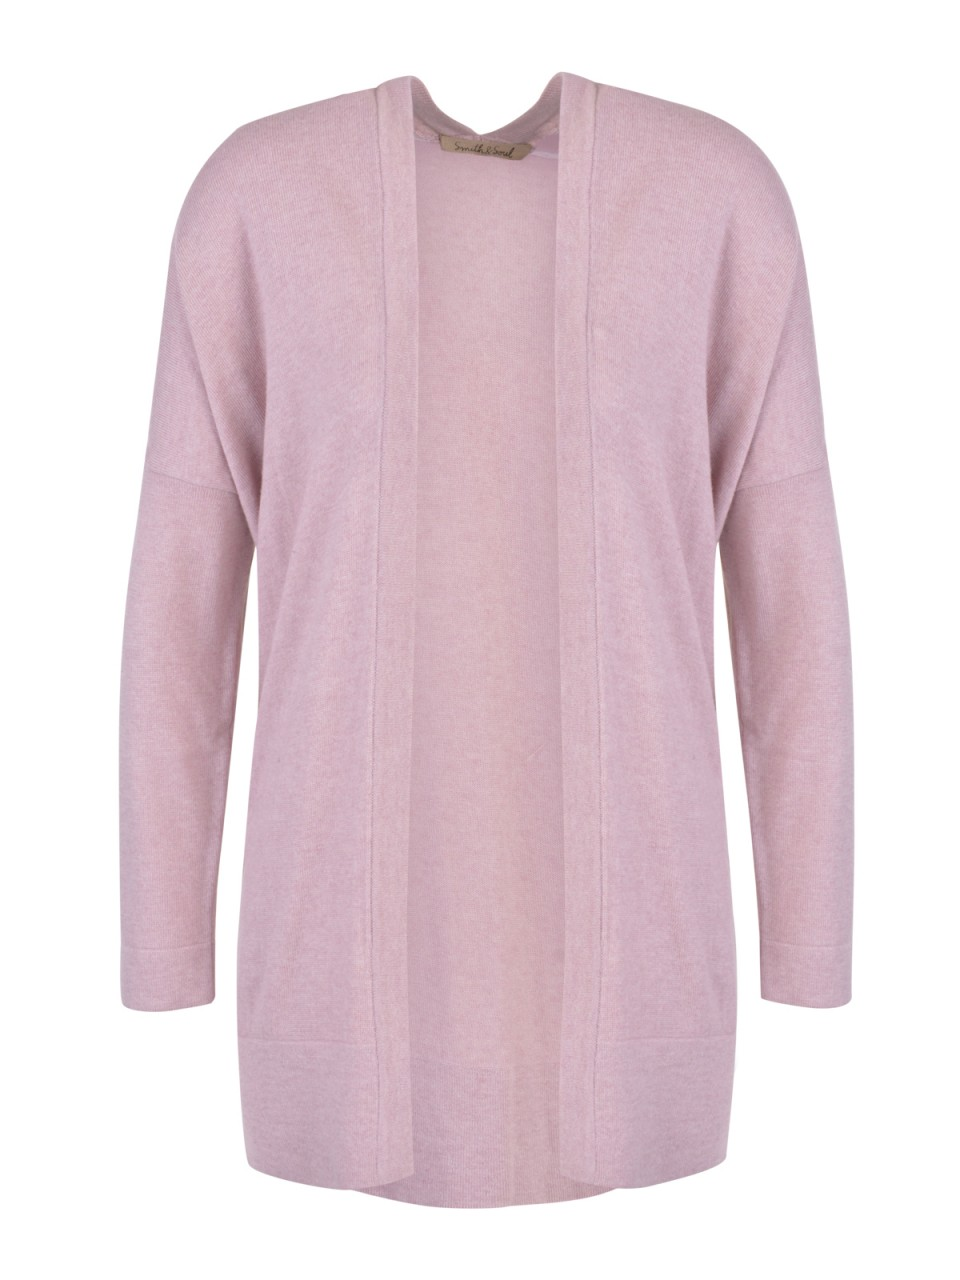 Jacken - SMITH SOUL Damen Cardigan, rosa  - Onlineshop Designermode.com